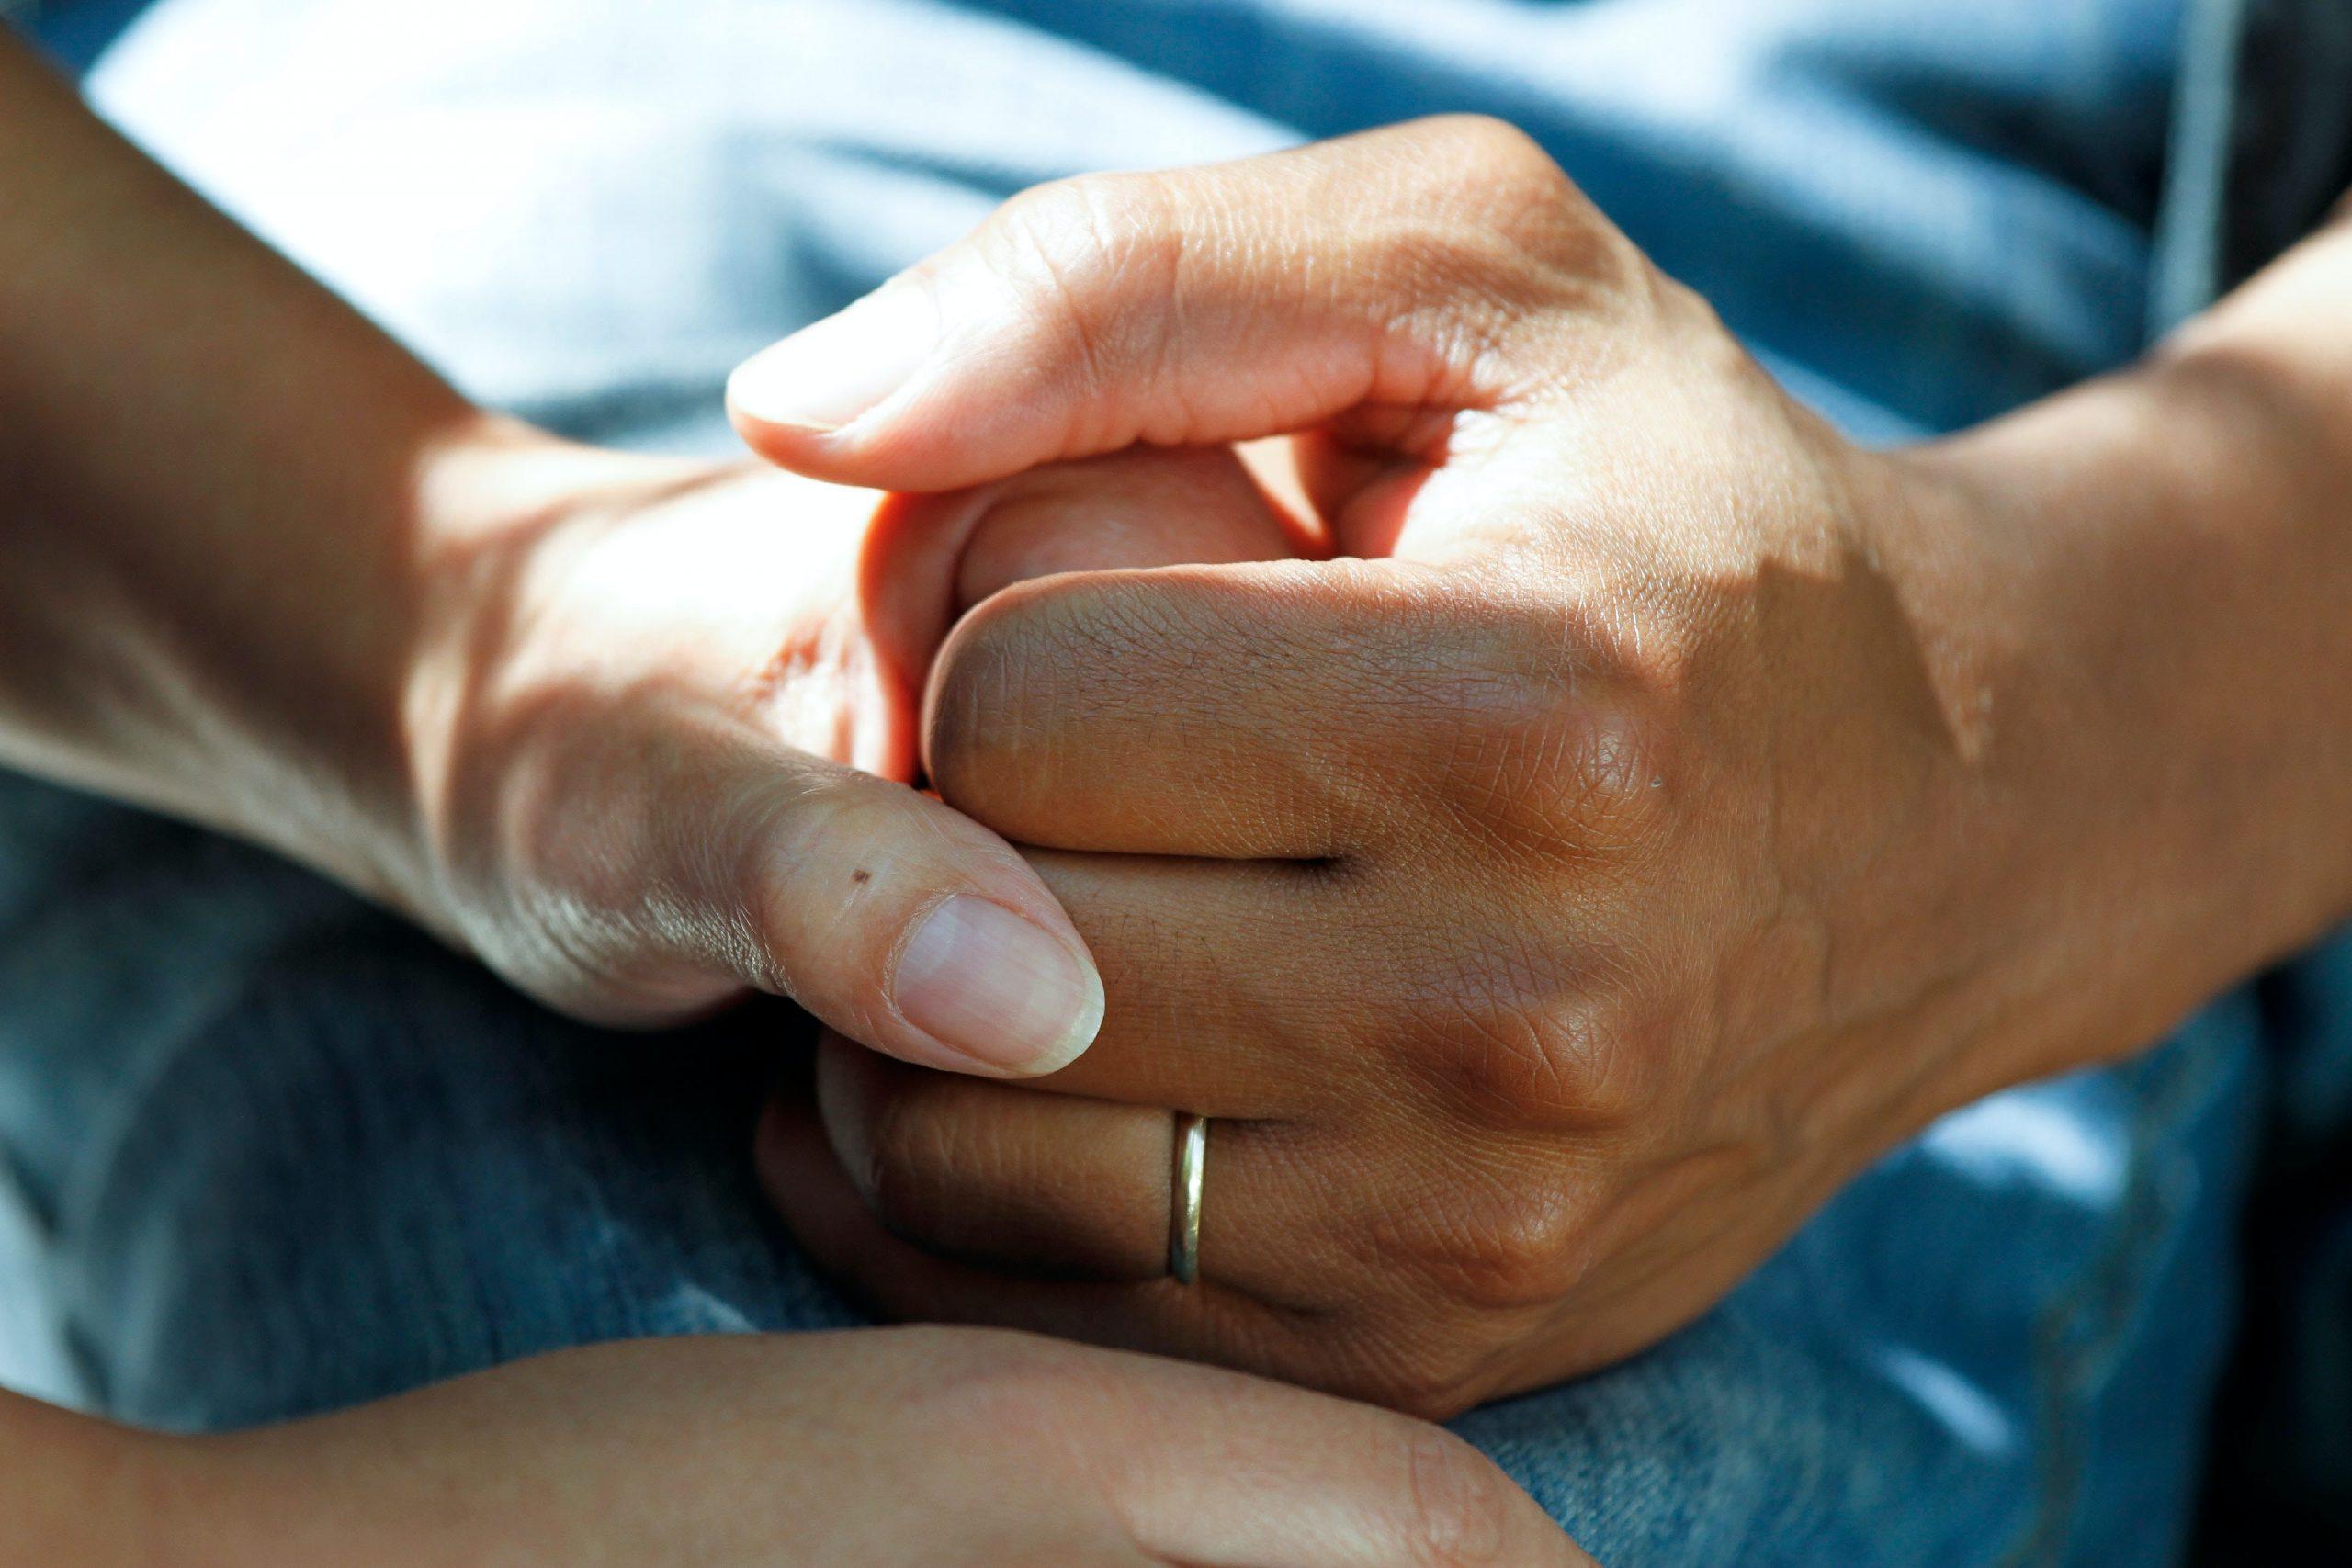 7 Ways To Improve Patient Care